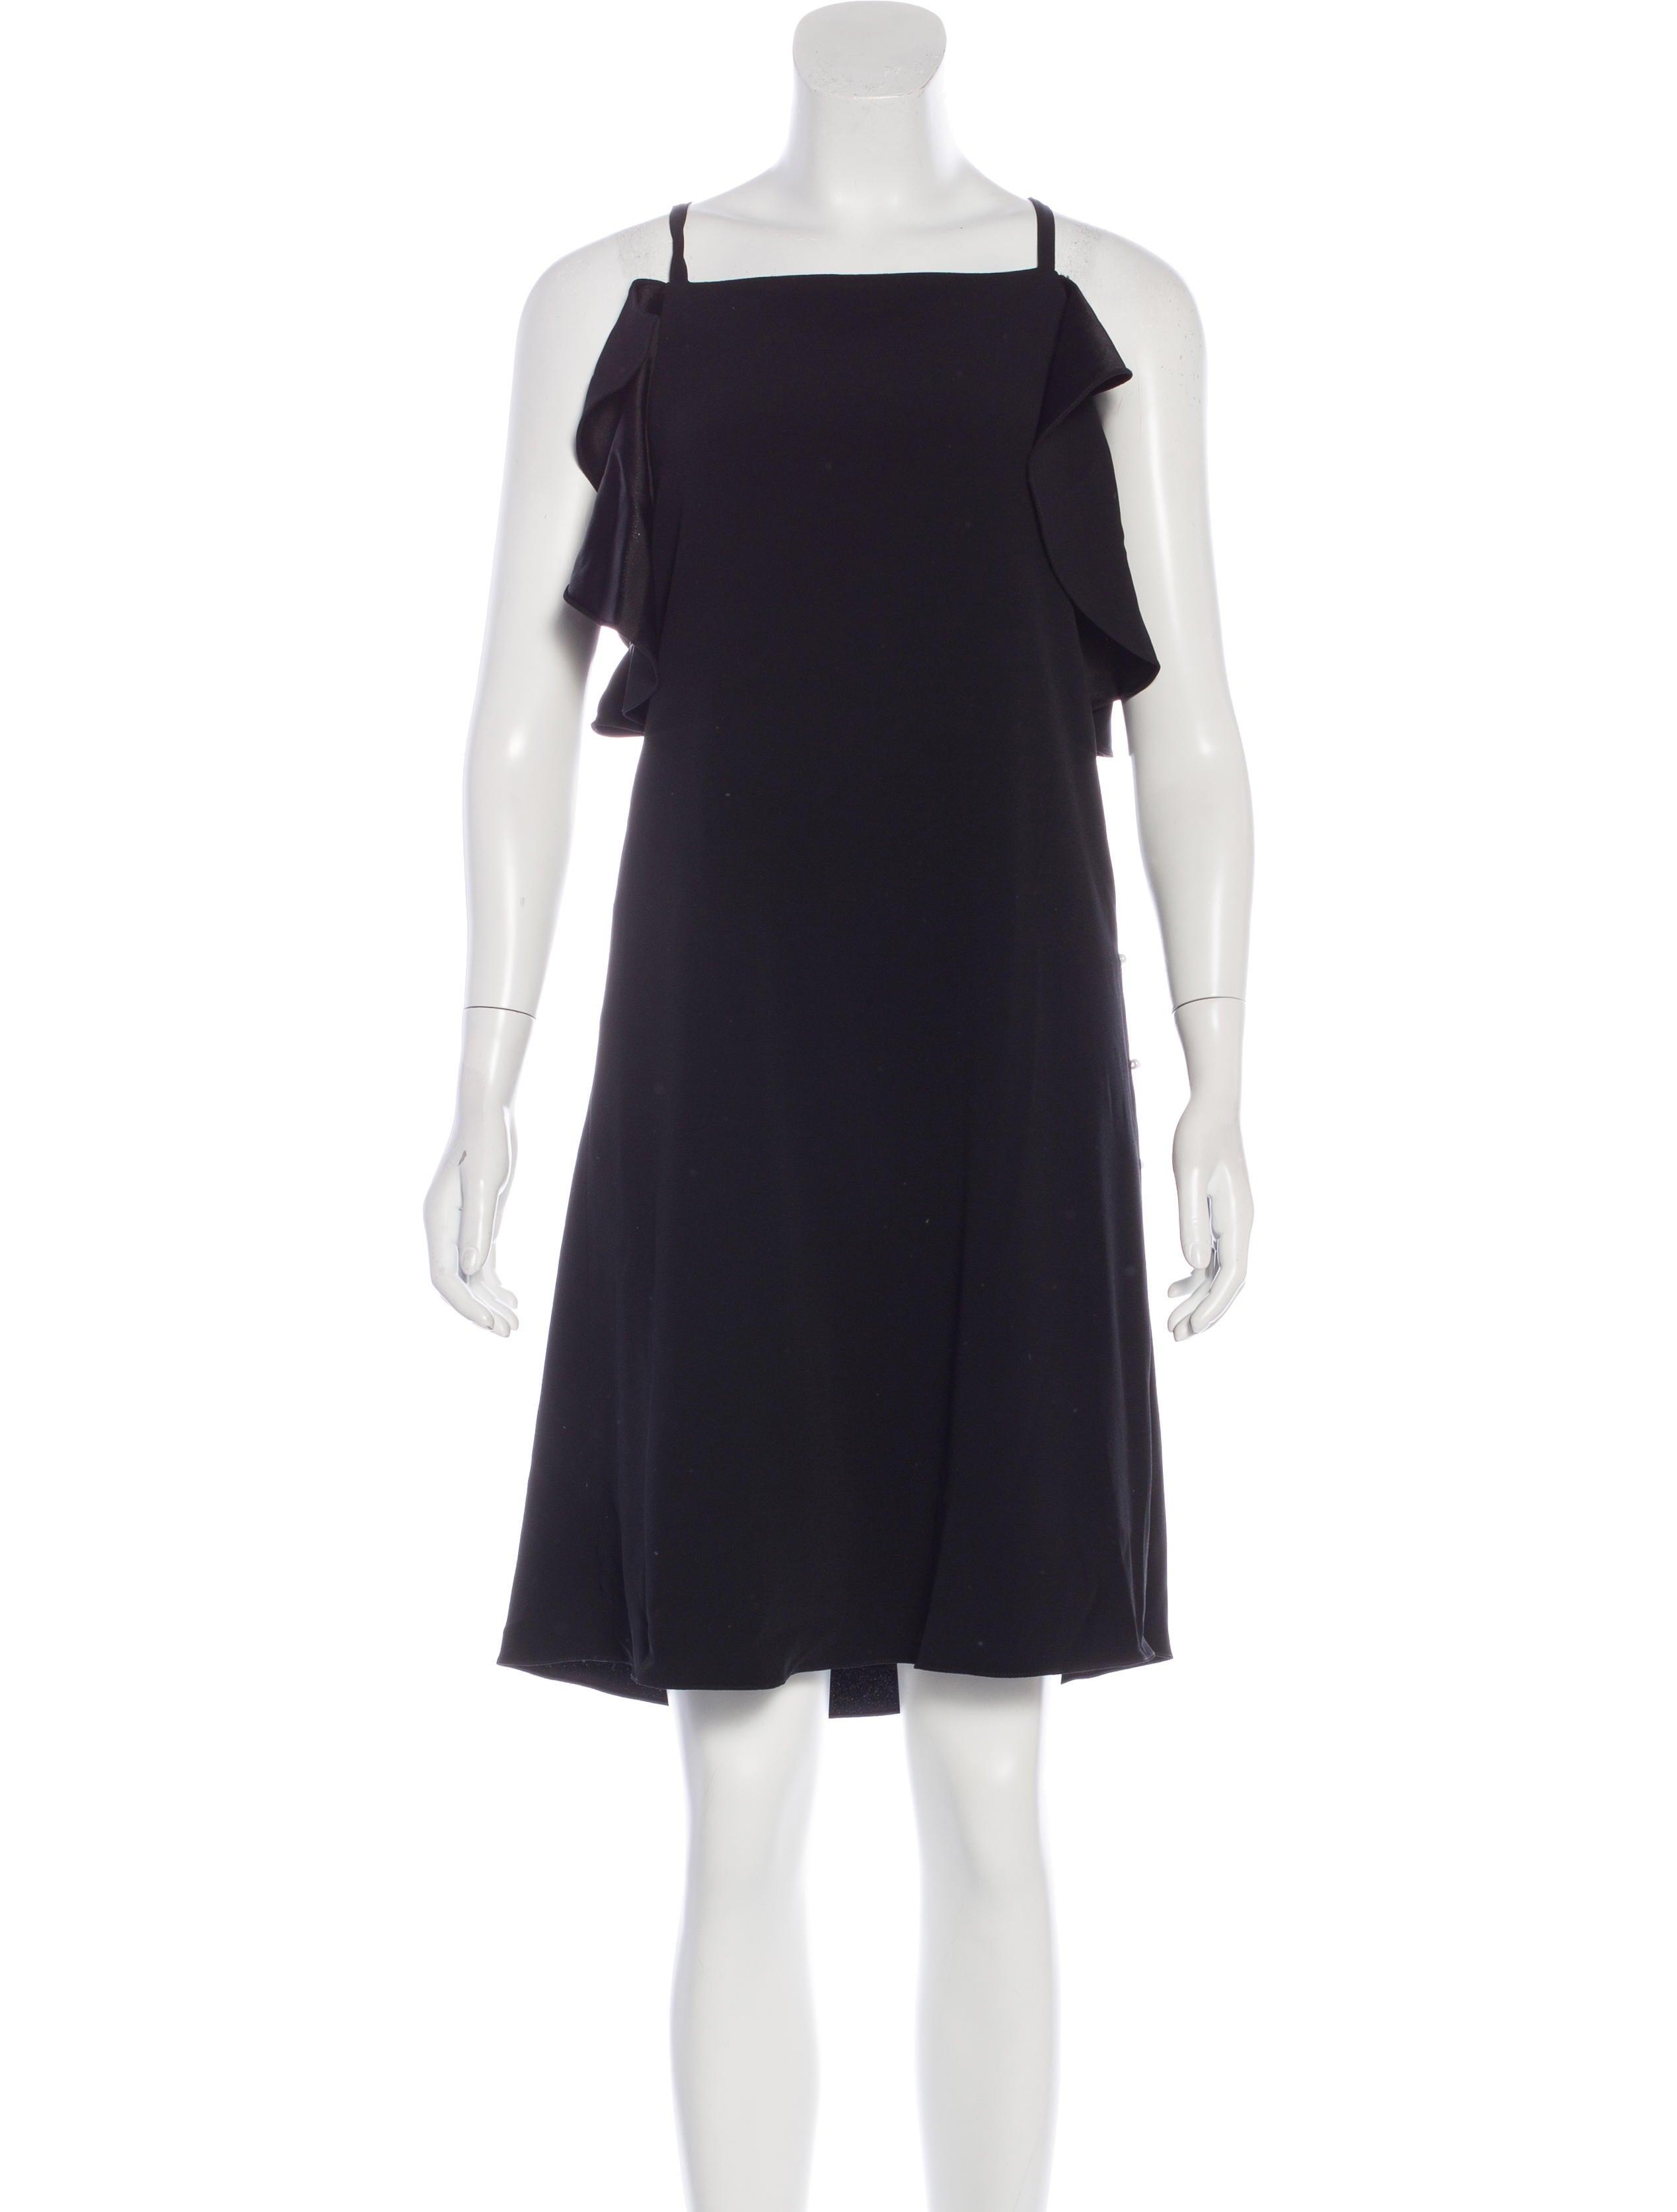 Derek Lam 10 Crosby Pearl Accented Sleeveless Dress